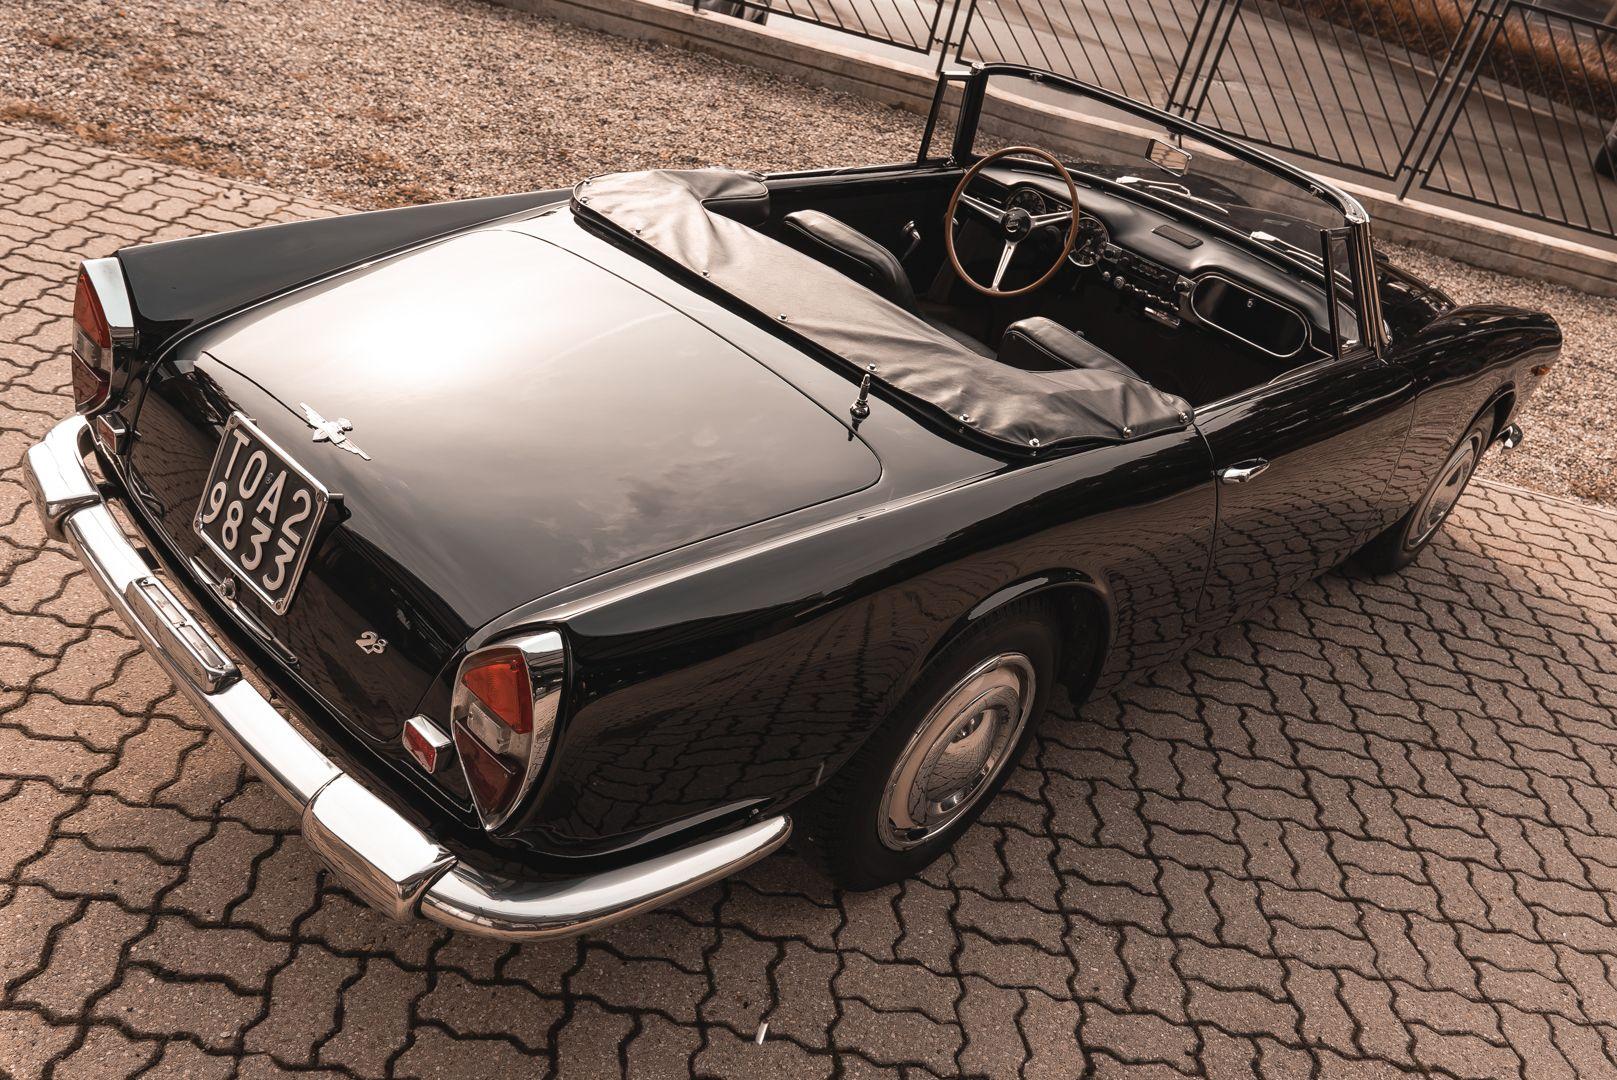 1968 Lancia Flaminia Touring Convertible 2800 3C 79122